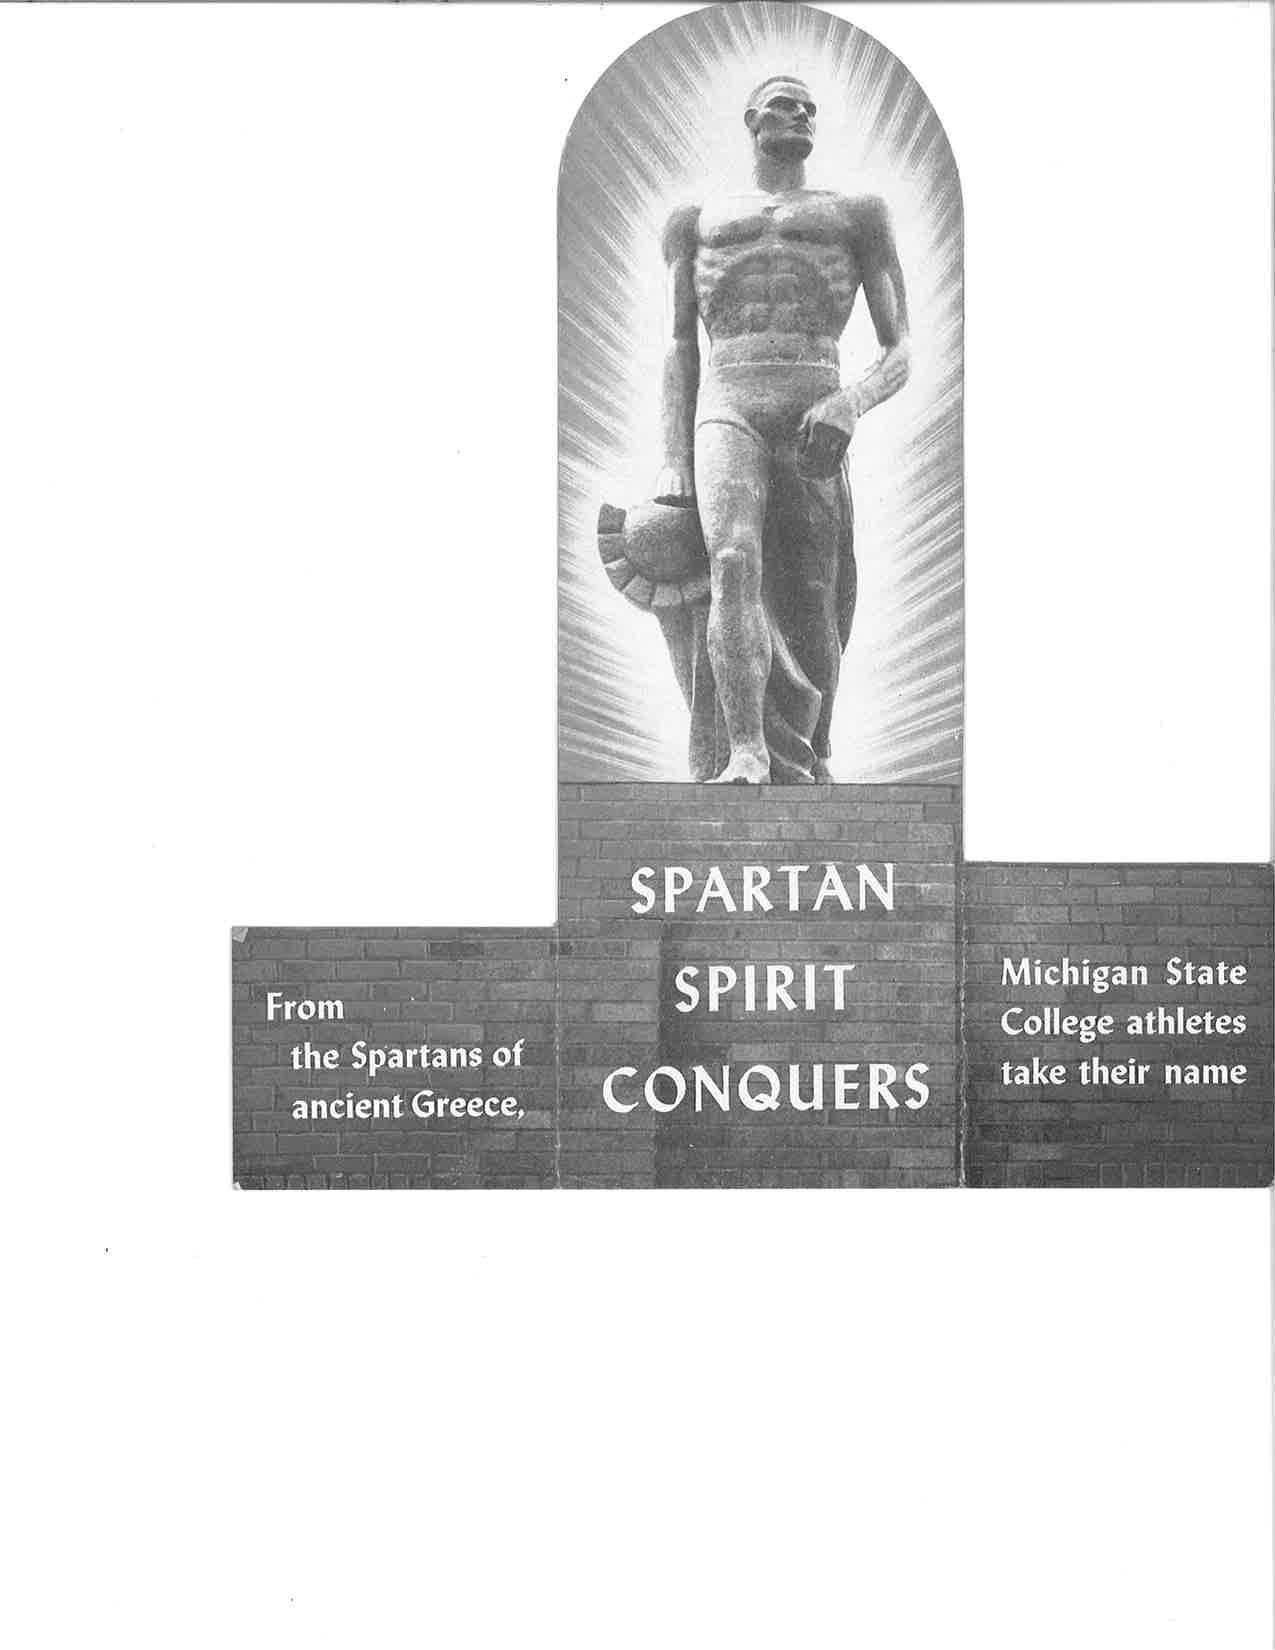 Spartan Statue Unveiling program, 1945